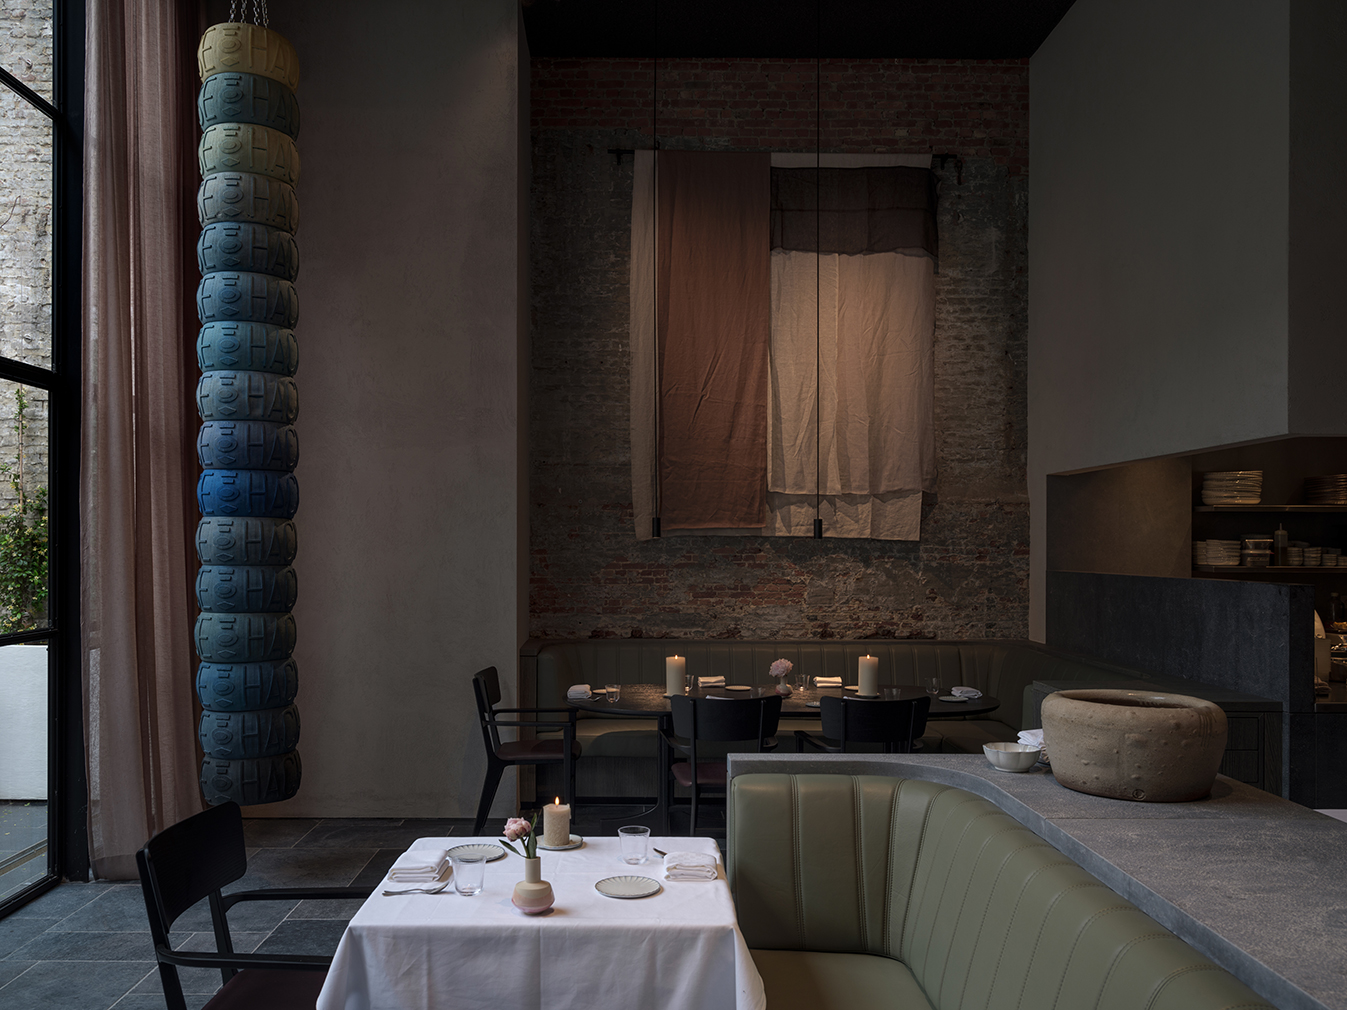 Flemish artists inspire the sumptuous interiors of Antwerp restaurant Le Pristine